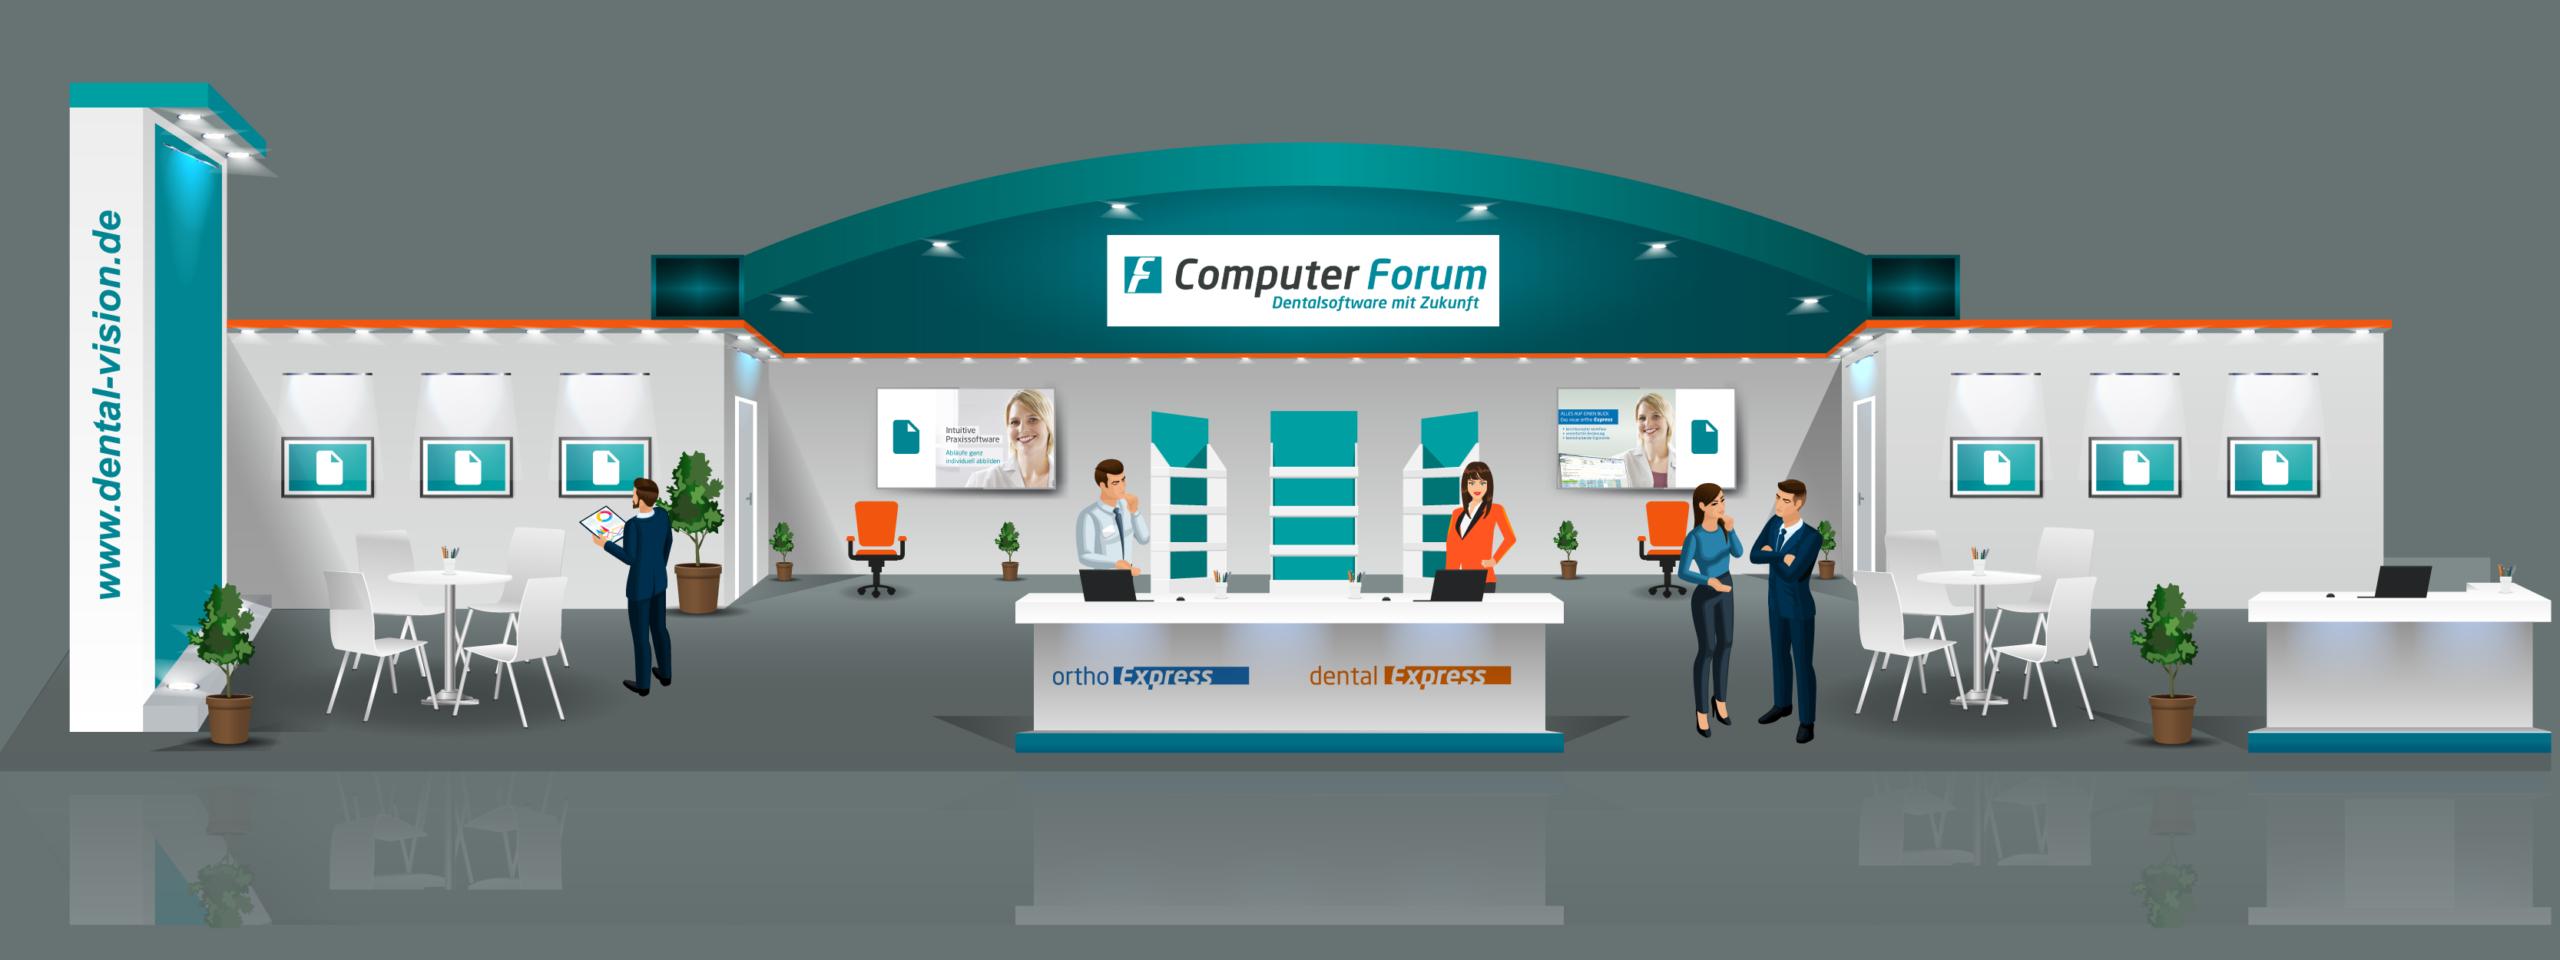 VDDS Frühjahrsmesse 2021 - Messestand der Computer Forum GmbH